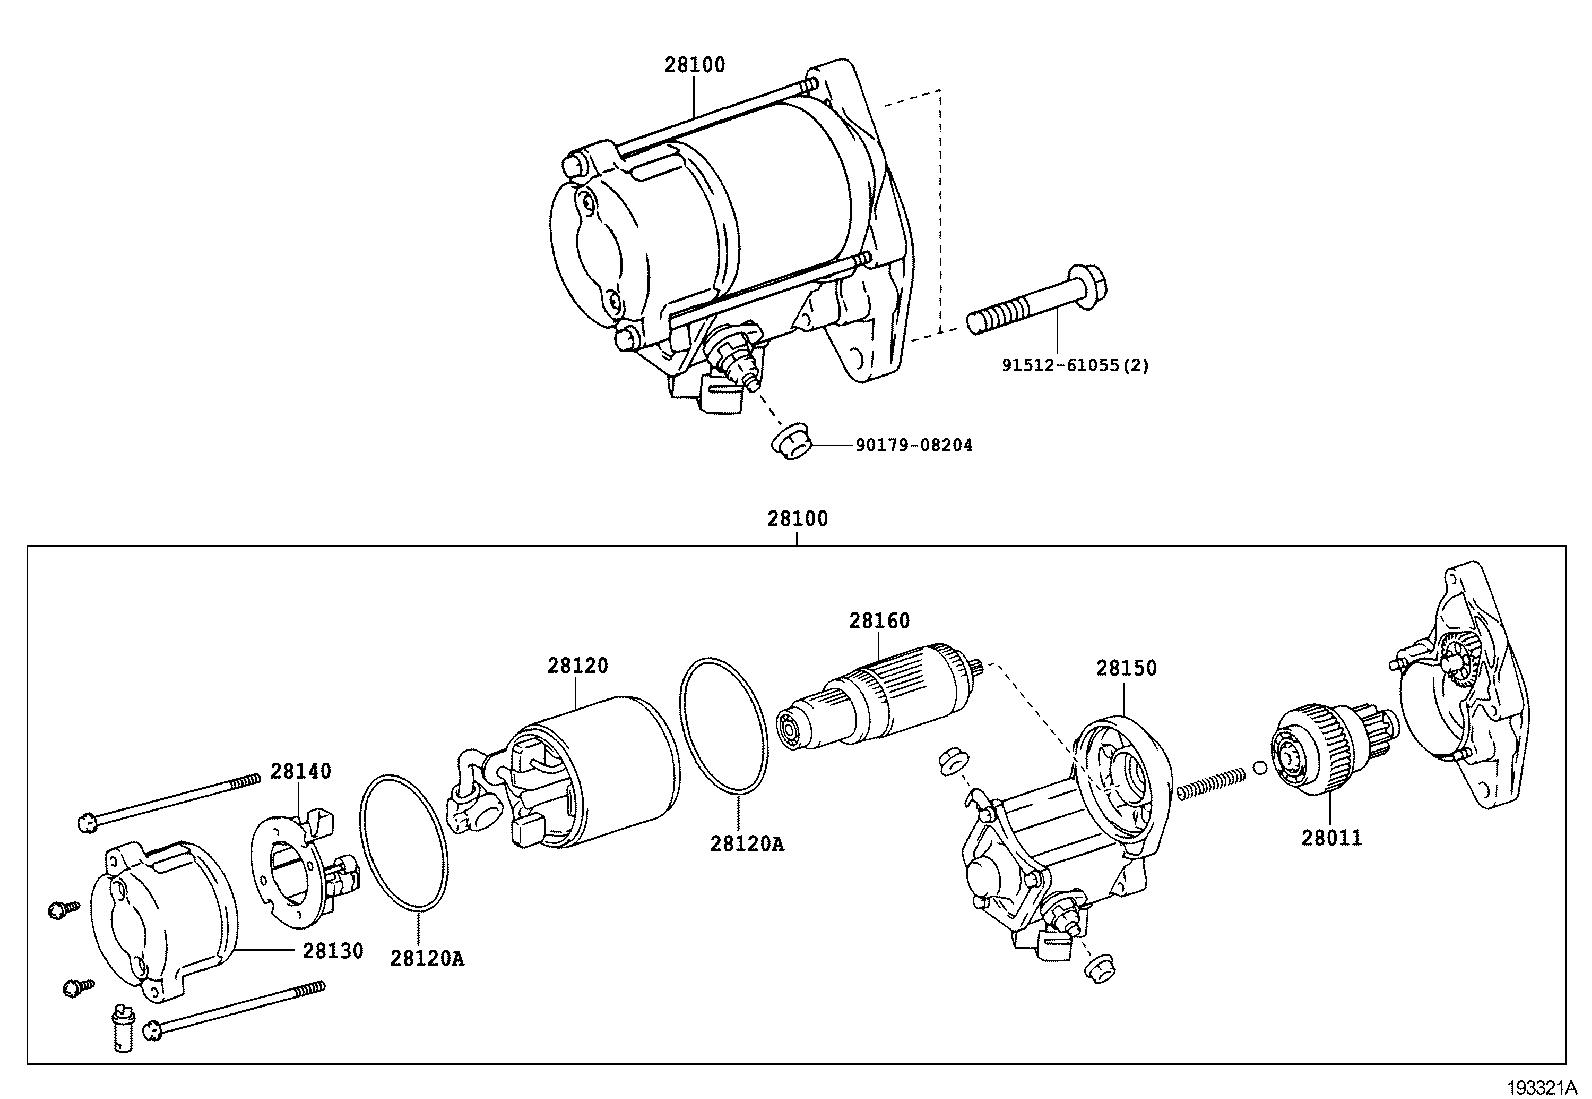 Wiring Diagram Toyota Fortuner : Toyota fortuner engine diagram chevy msd ignition